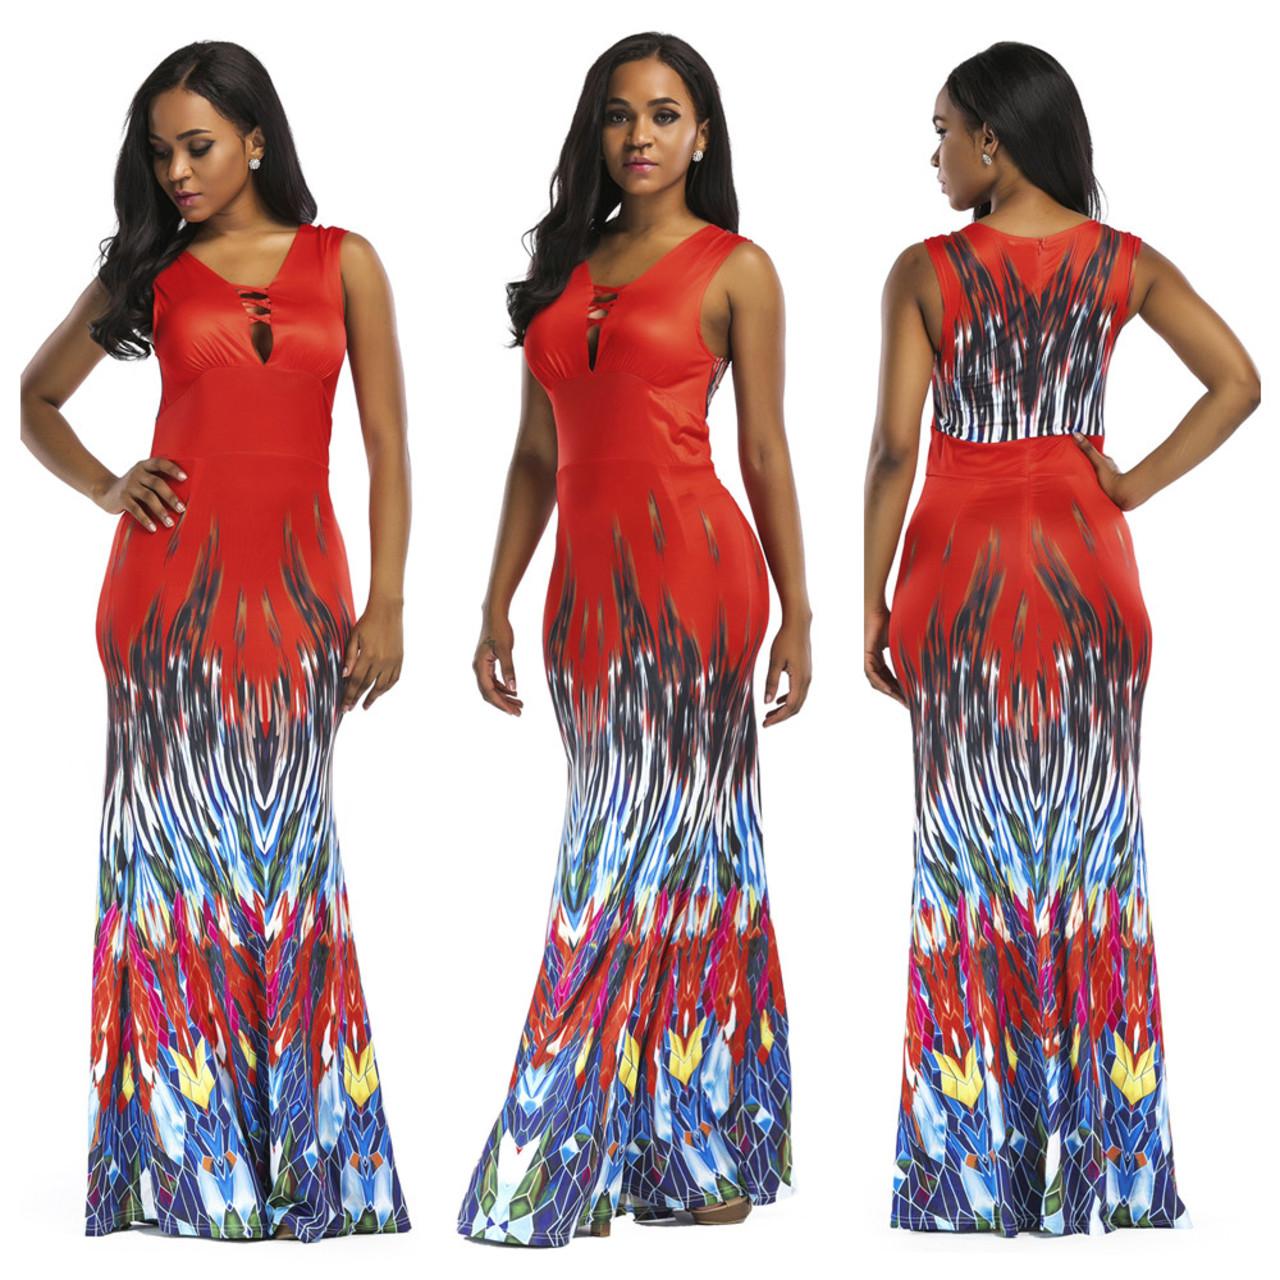 c5868ba5bad Beautiful Long Gown Dresses - Barrier Surveillance